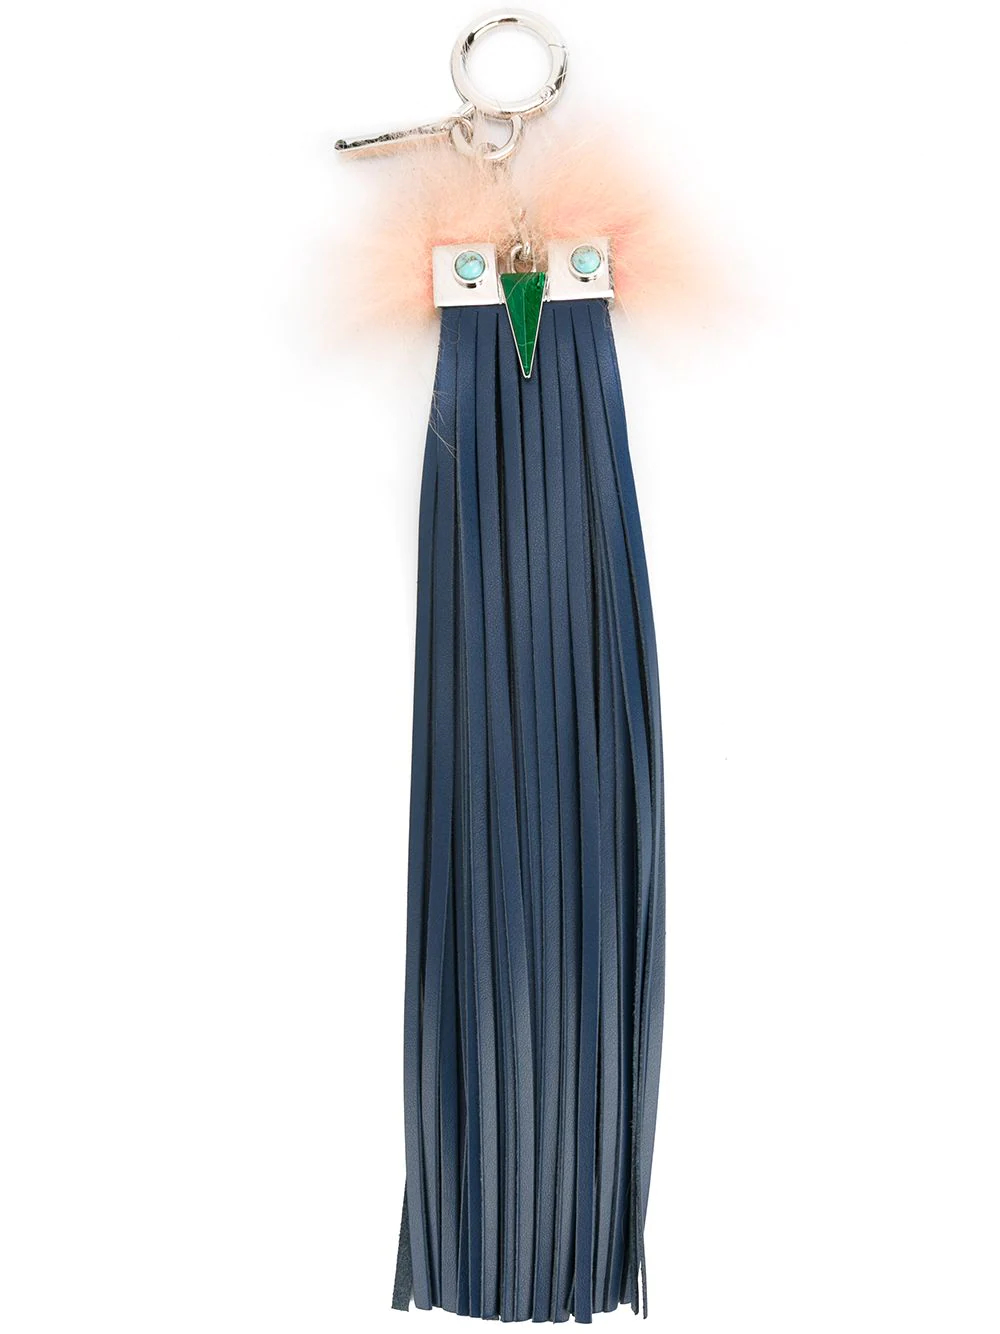 FENDI | Fendi брелок 'Bag Bug' | Clouty